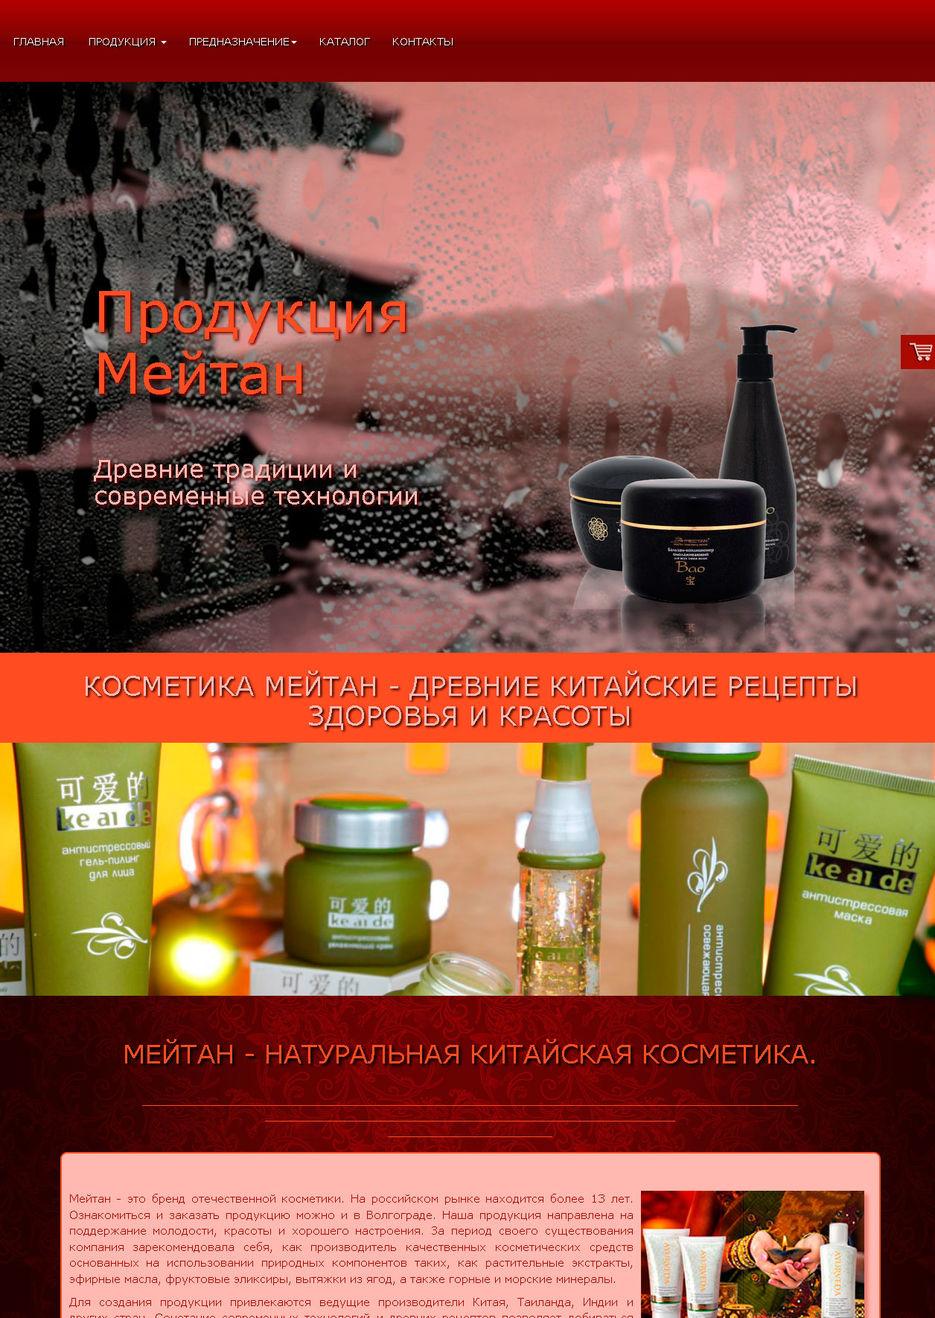 Косметика мейтан официальный сайт каталог отзывы